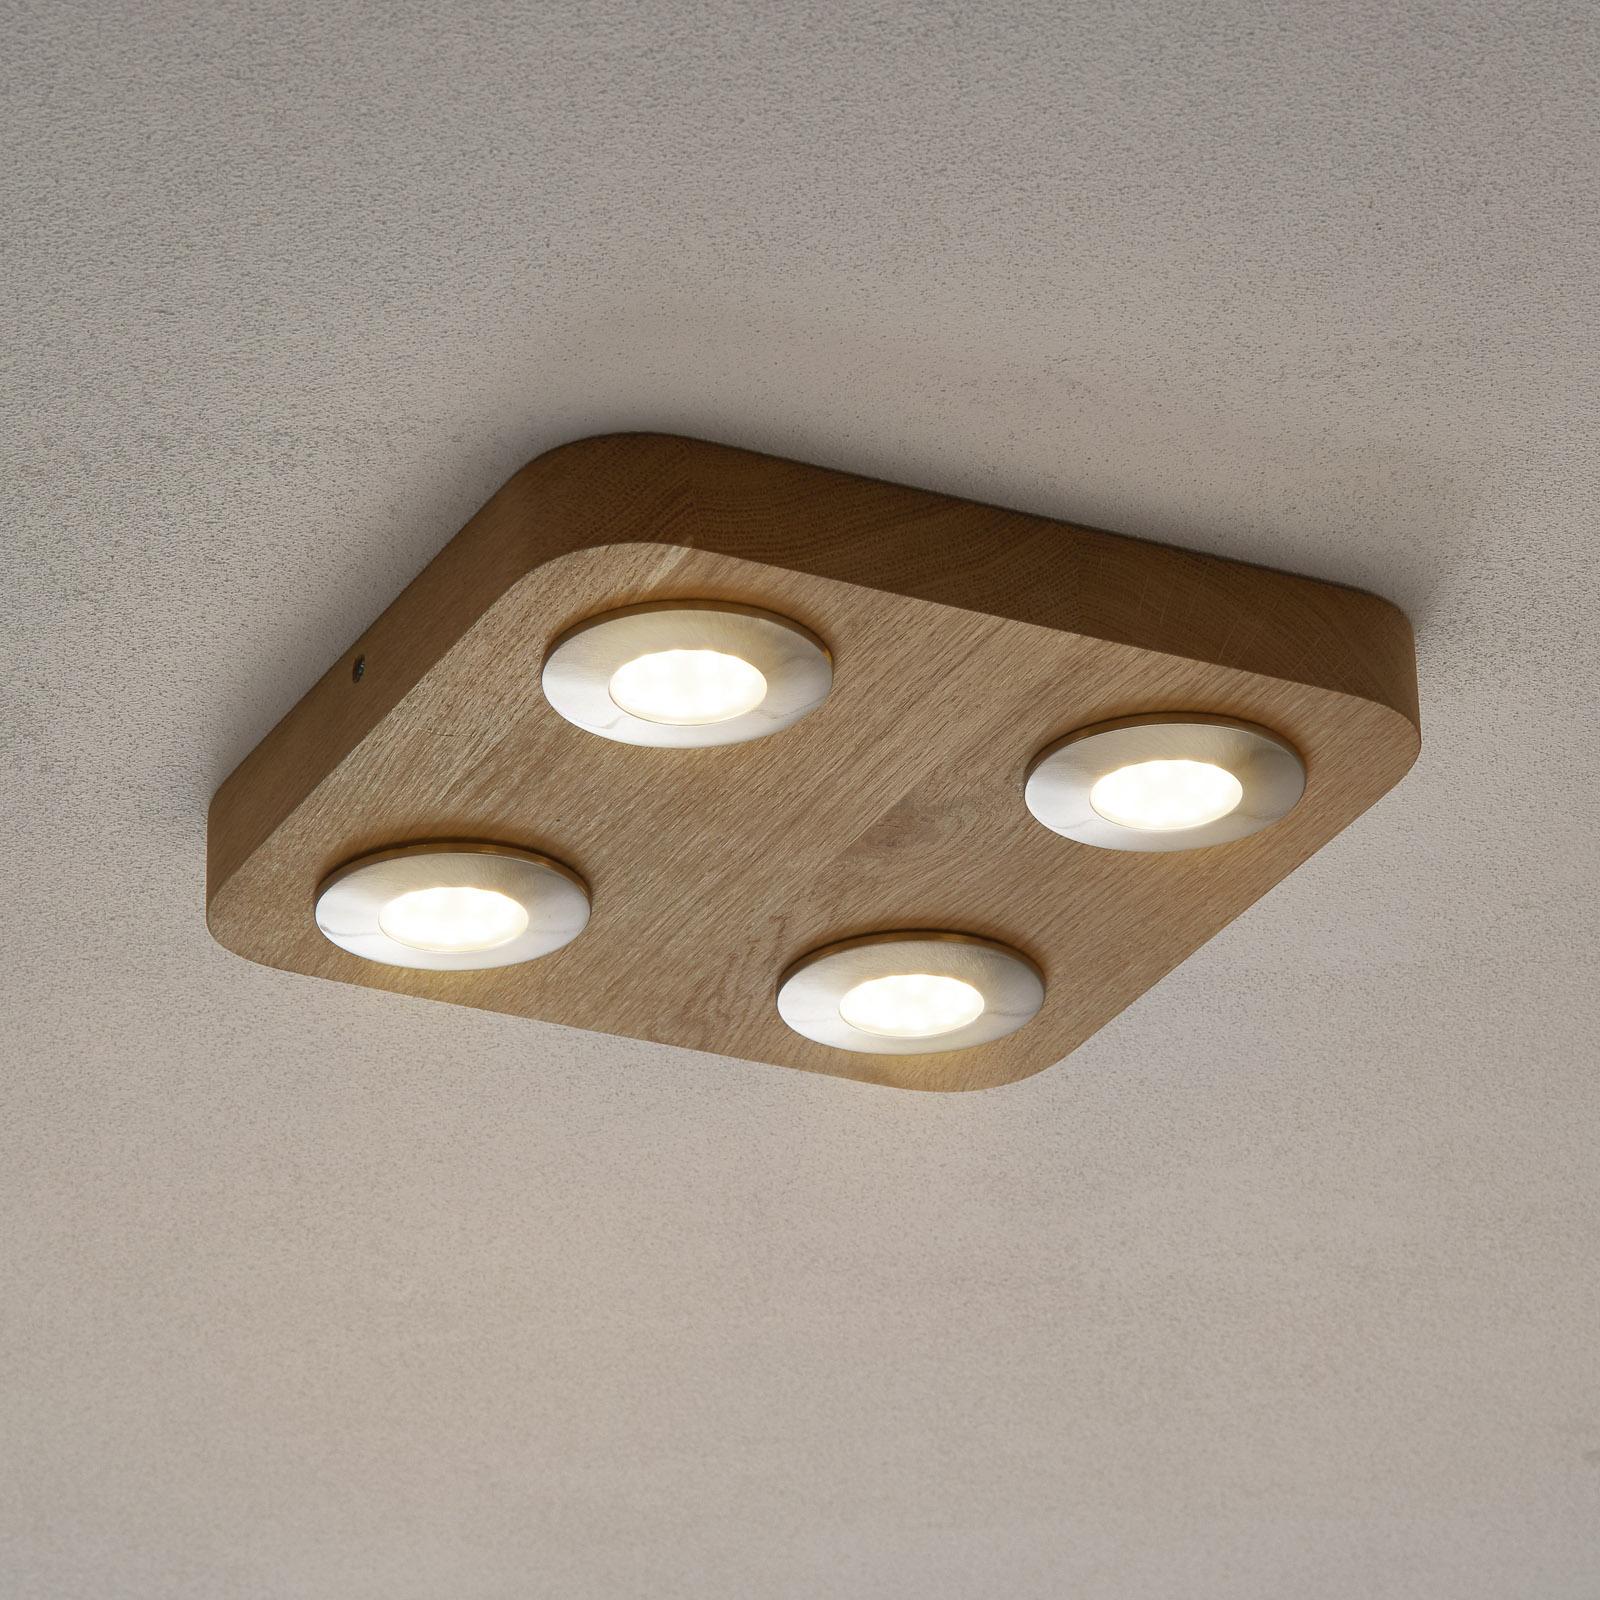 4-pkt. lampa sufitowa LED Sunniva, drewno dębowe